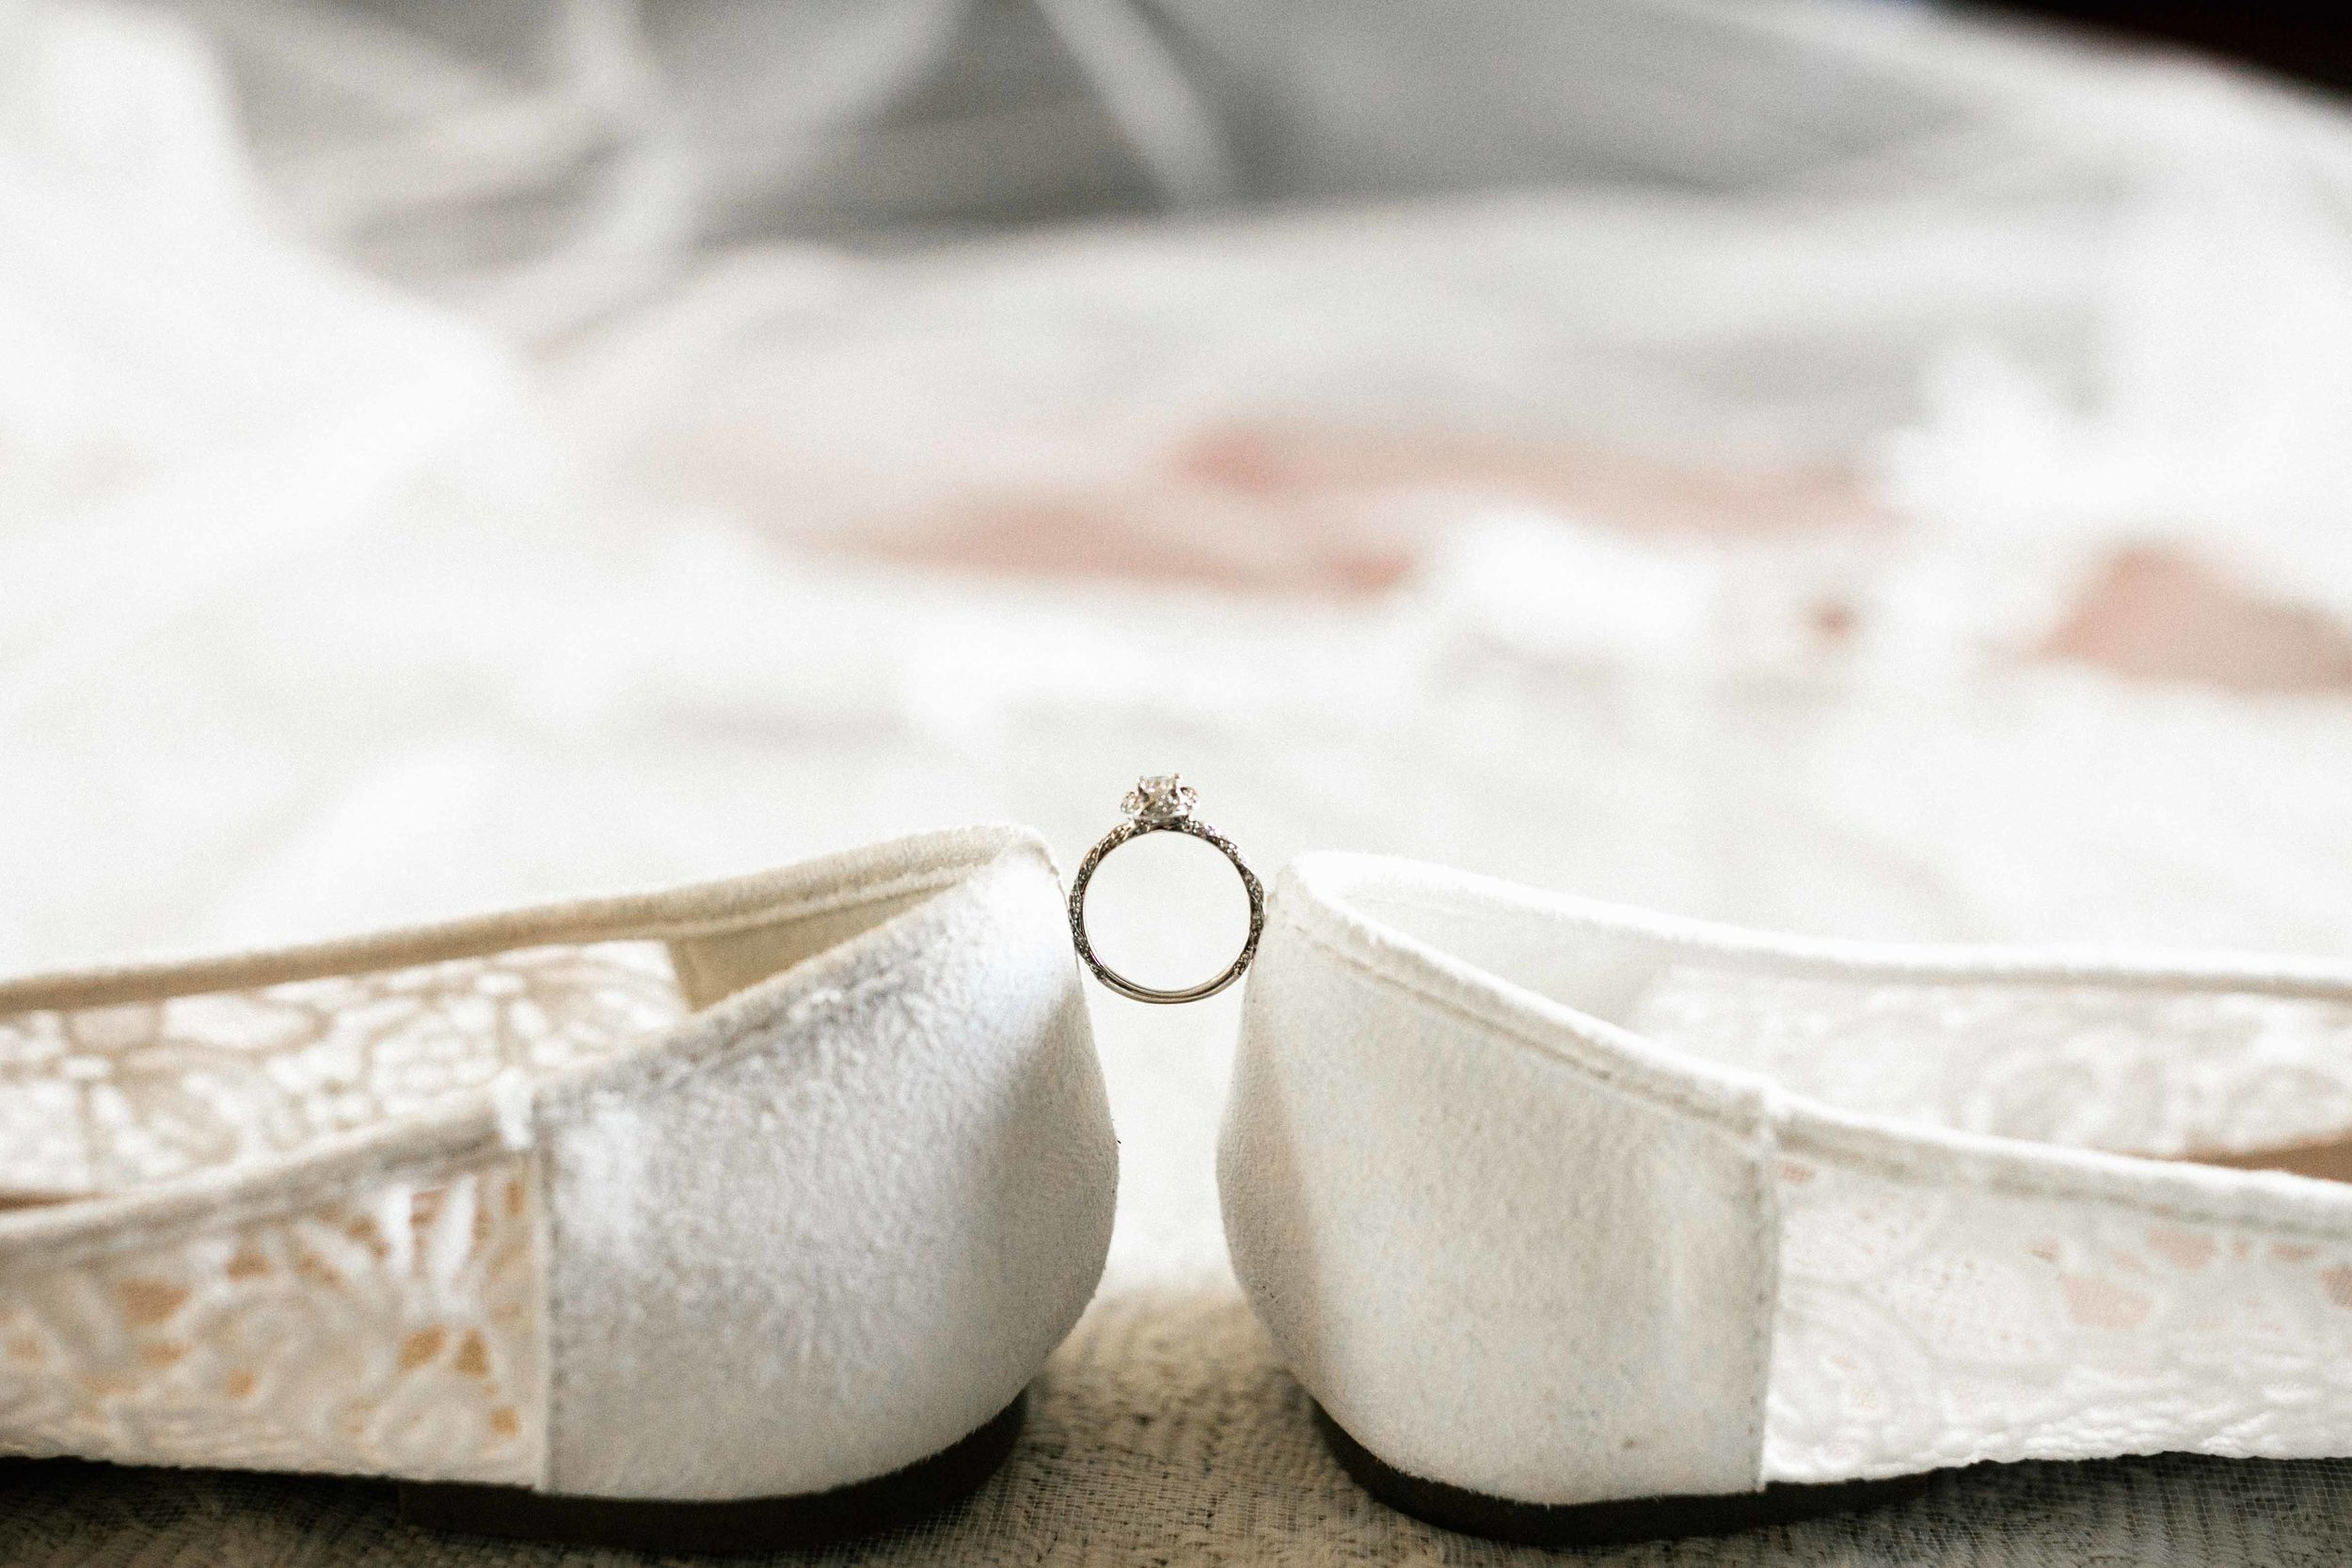 tuncannon-cellars-wedding-5.jpg